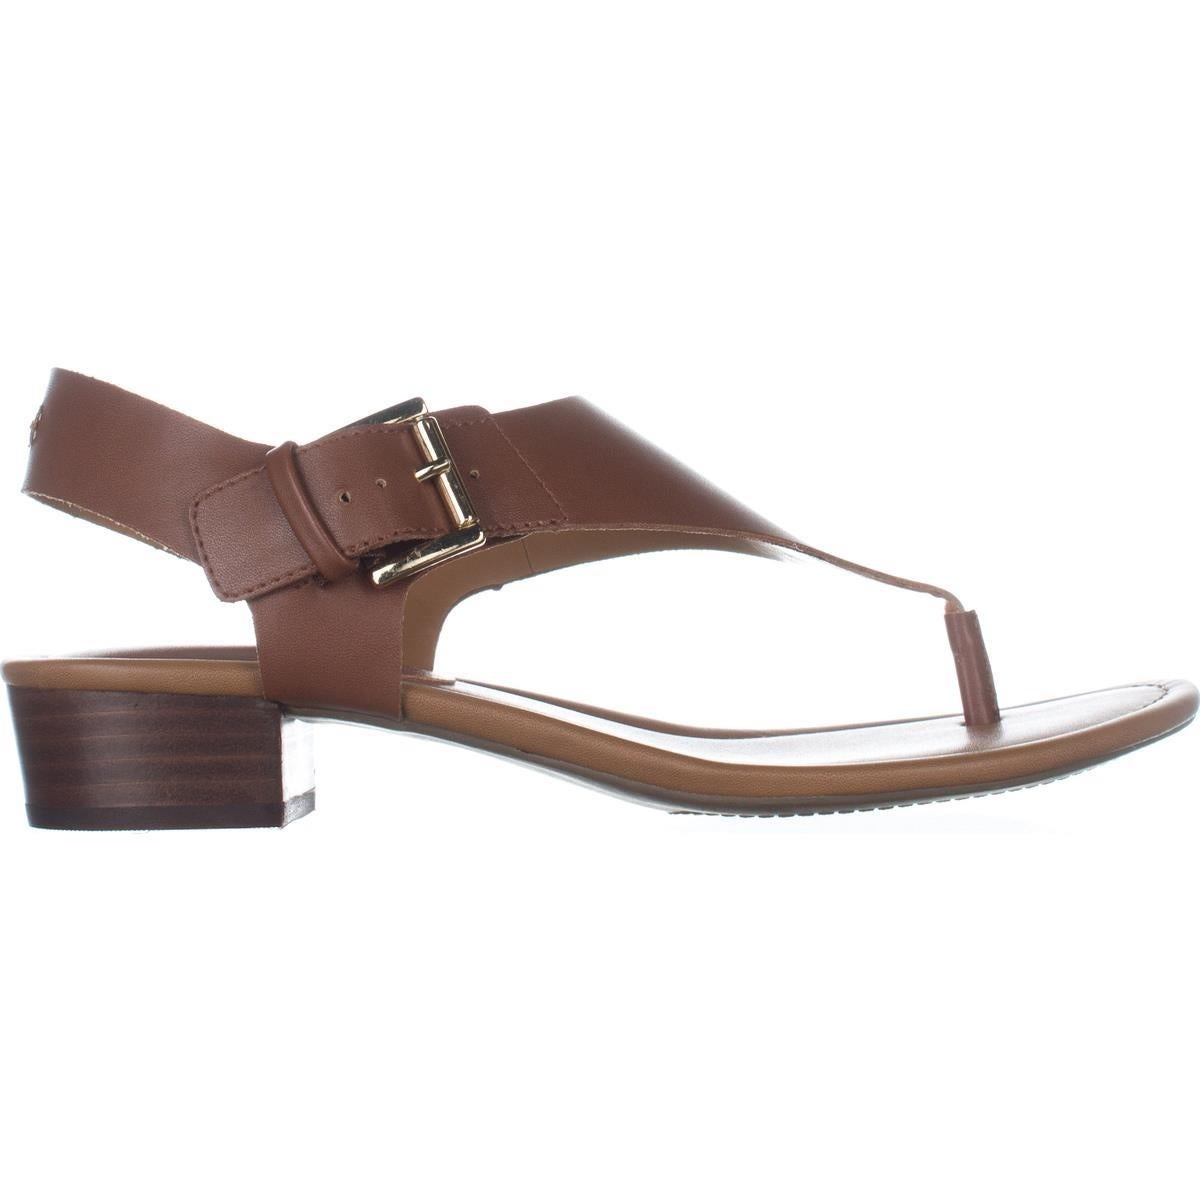 6816c1dd6efdf Shop Tommy Hilfiger Kitty T-Strap Thong Sandals